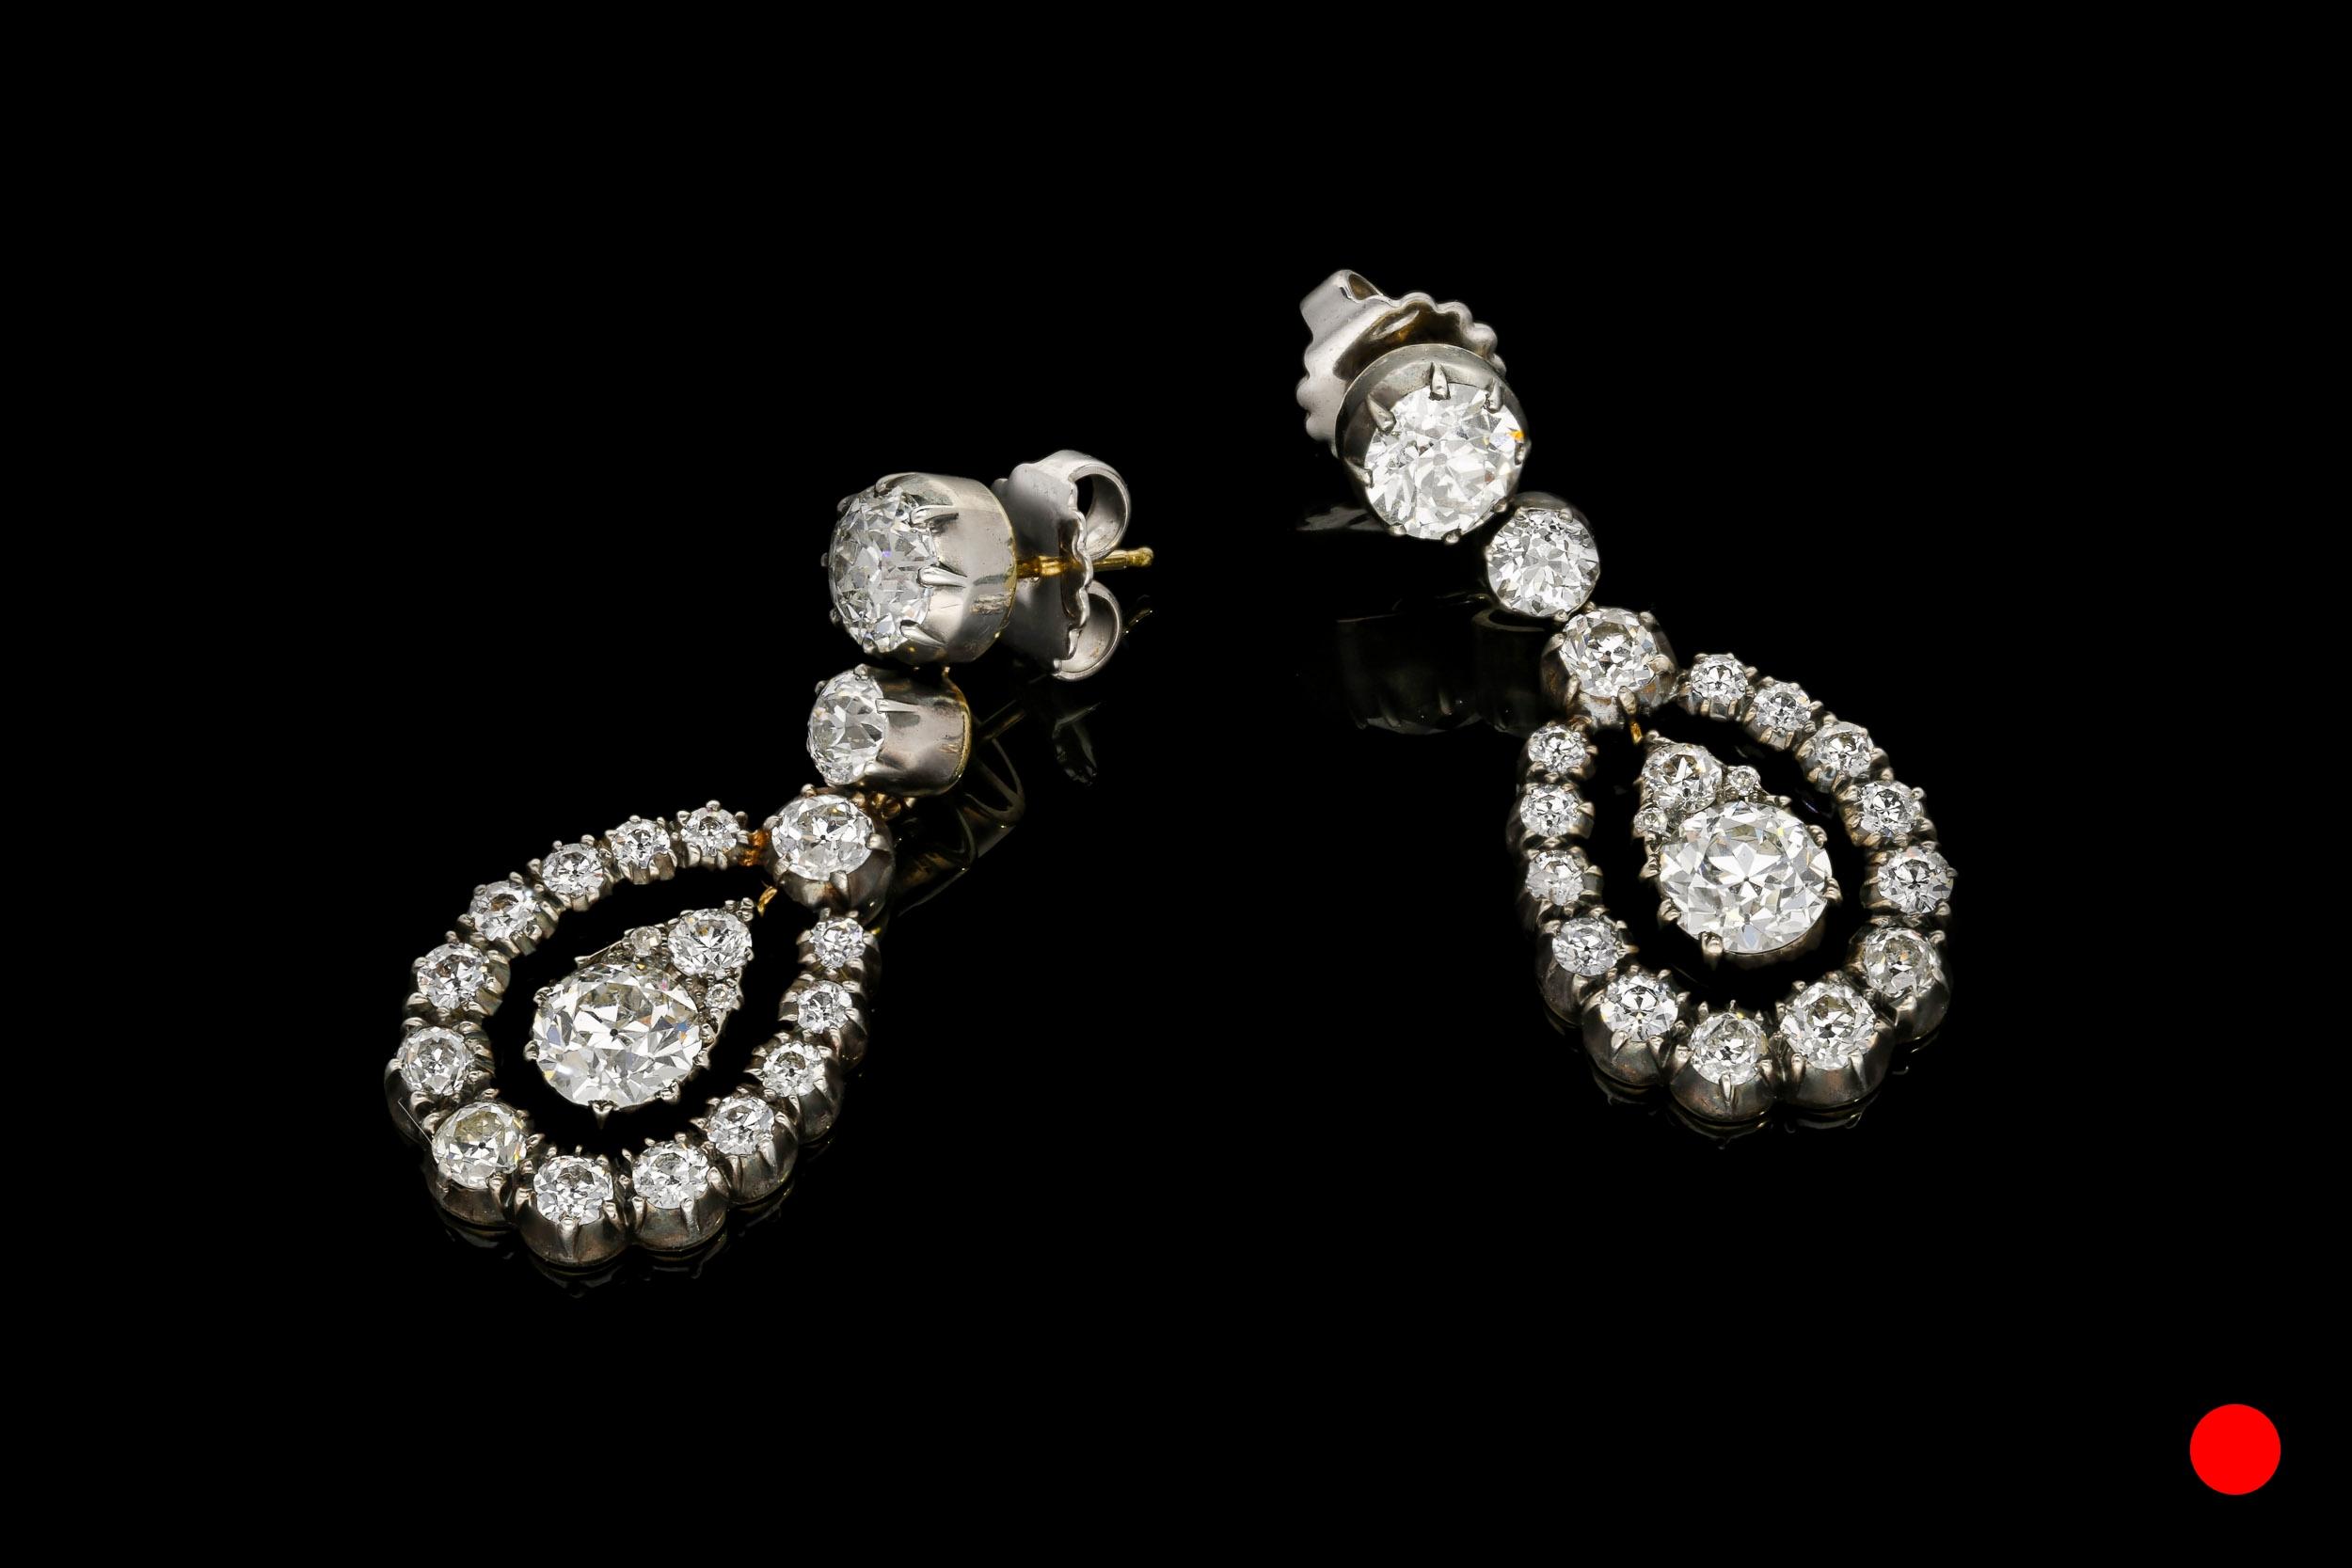 A pair of truly phenomenal Old European cut diamond drop earrings | £68500